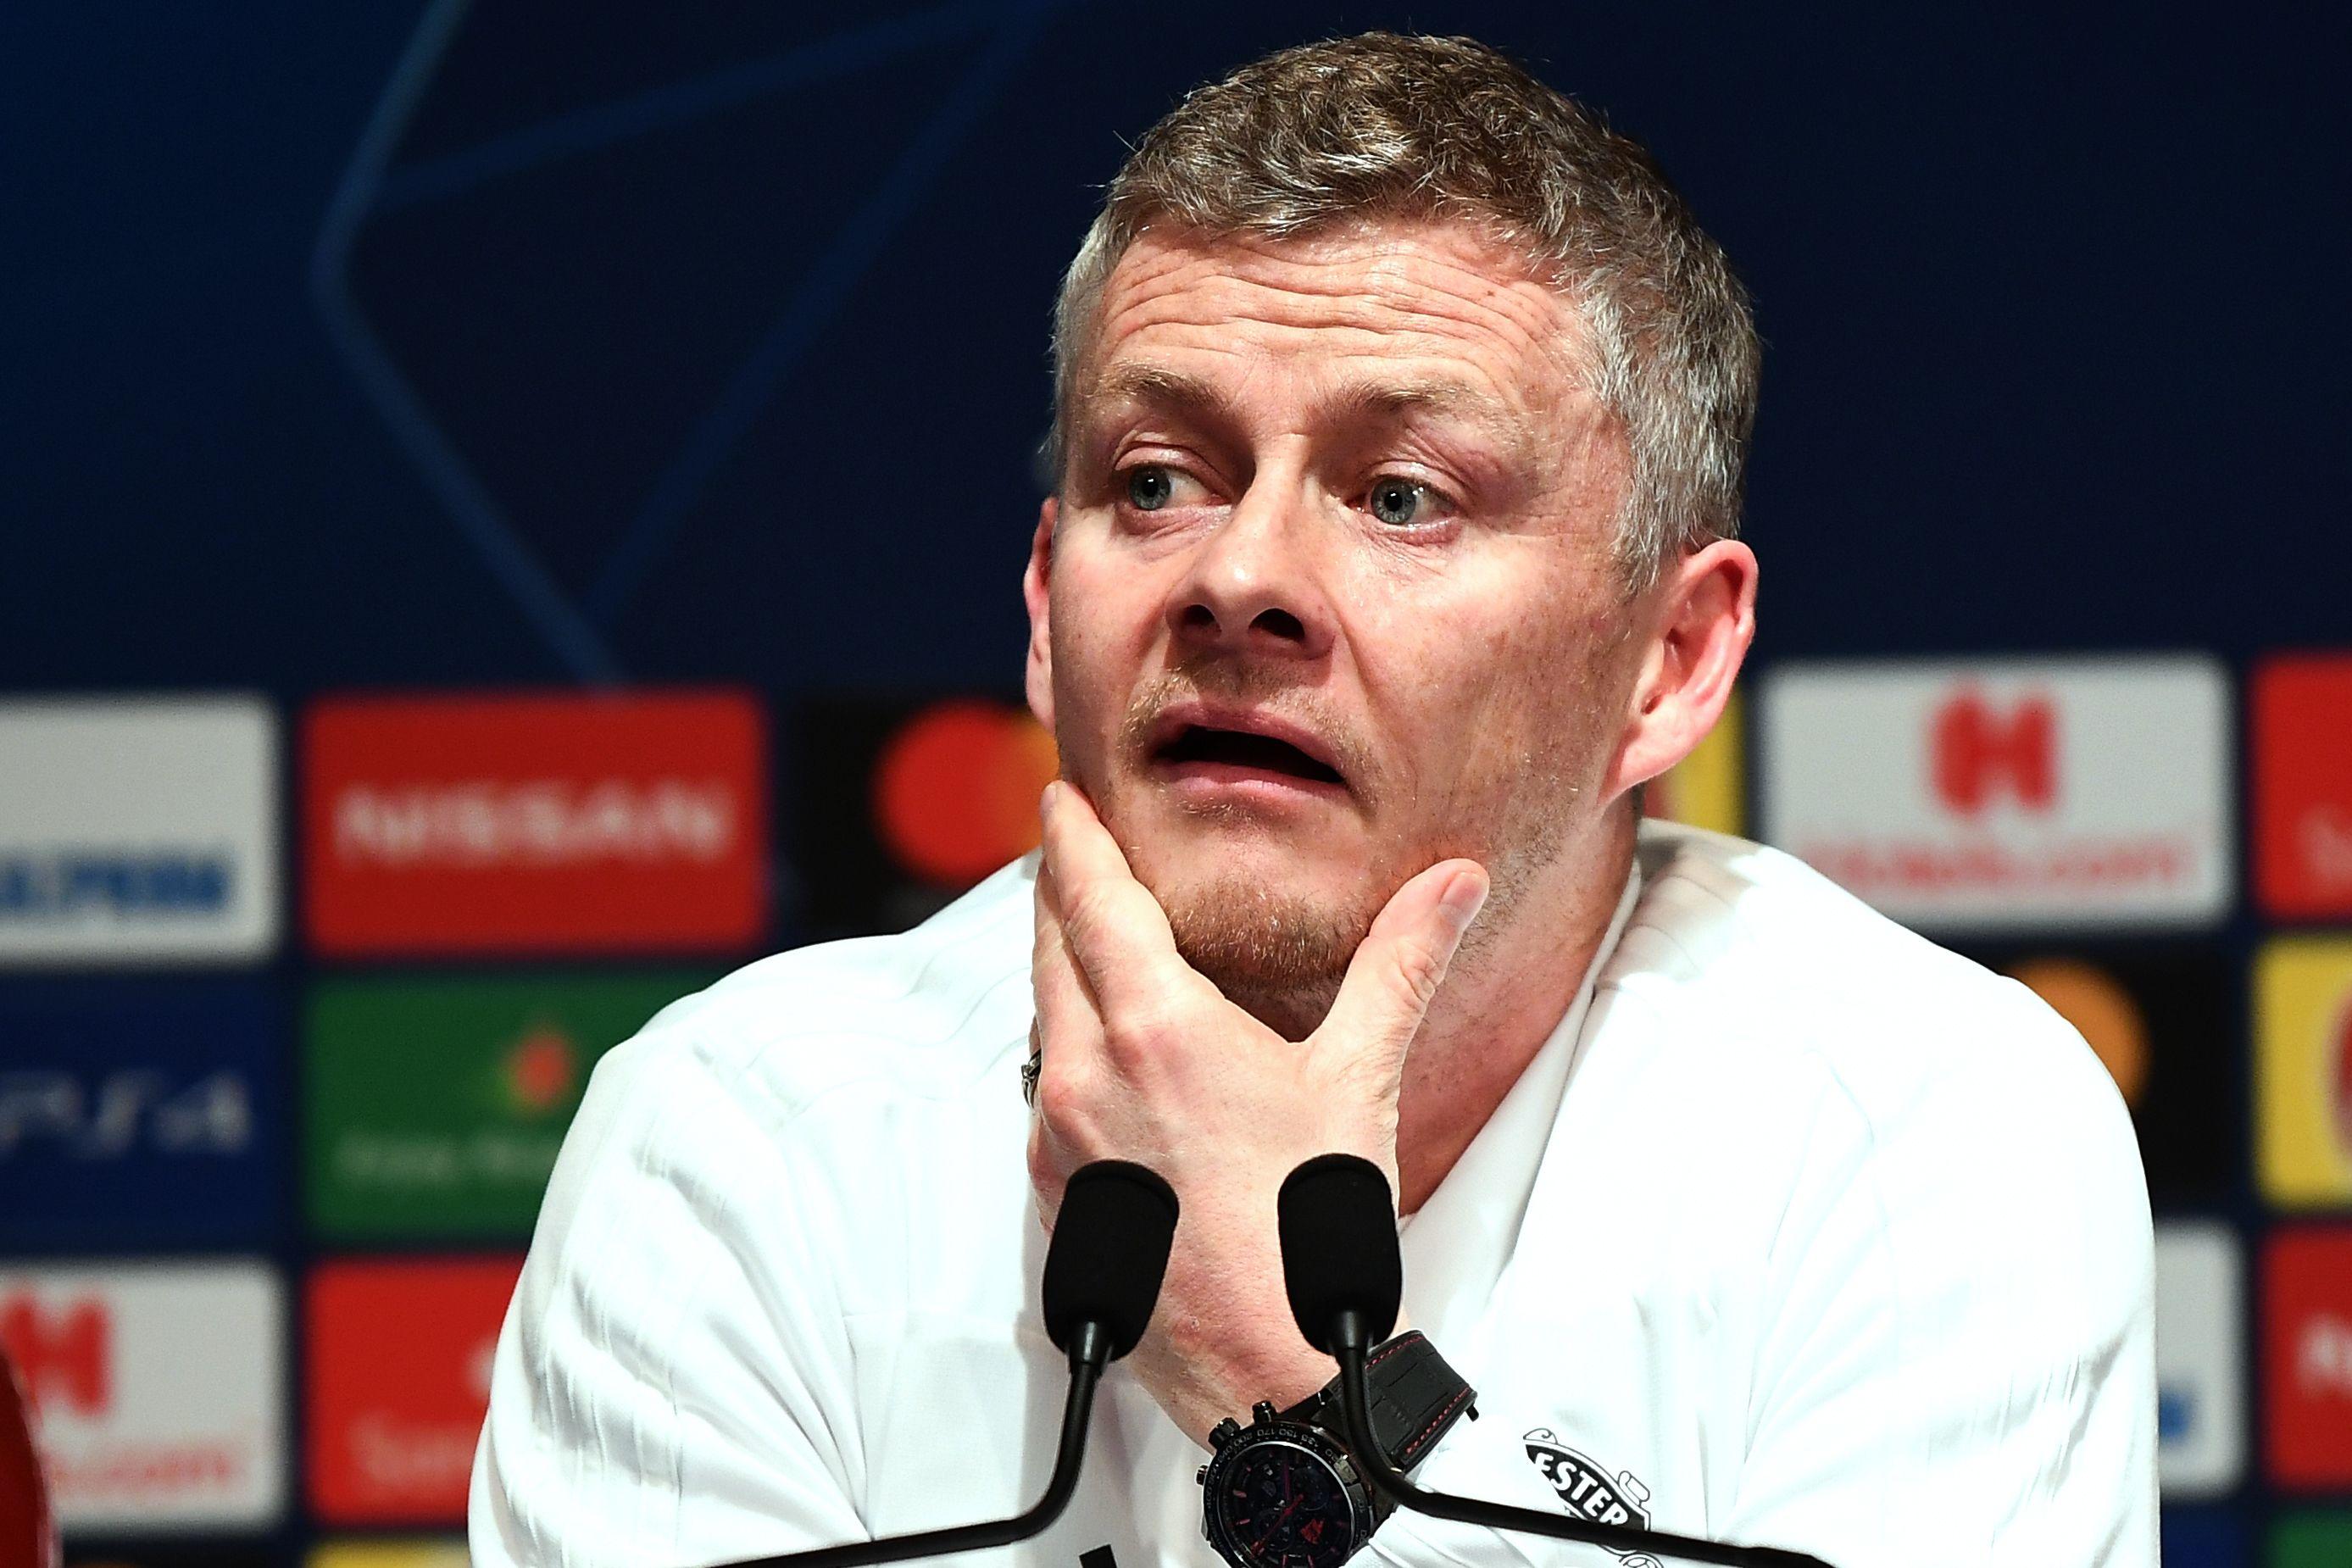 Ole Gunnar Solskjaer, técnico del Manchester United, en conferencia de prensa. (Foto Prensa Libre: AFP)